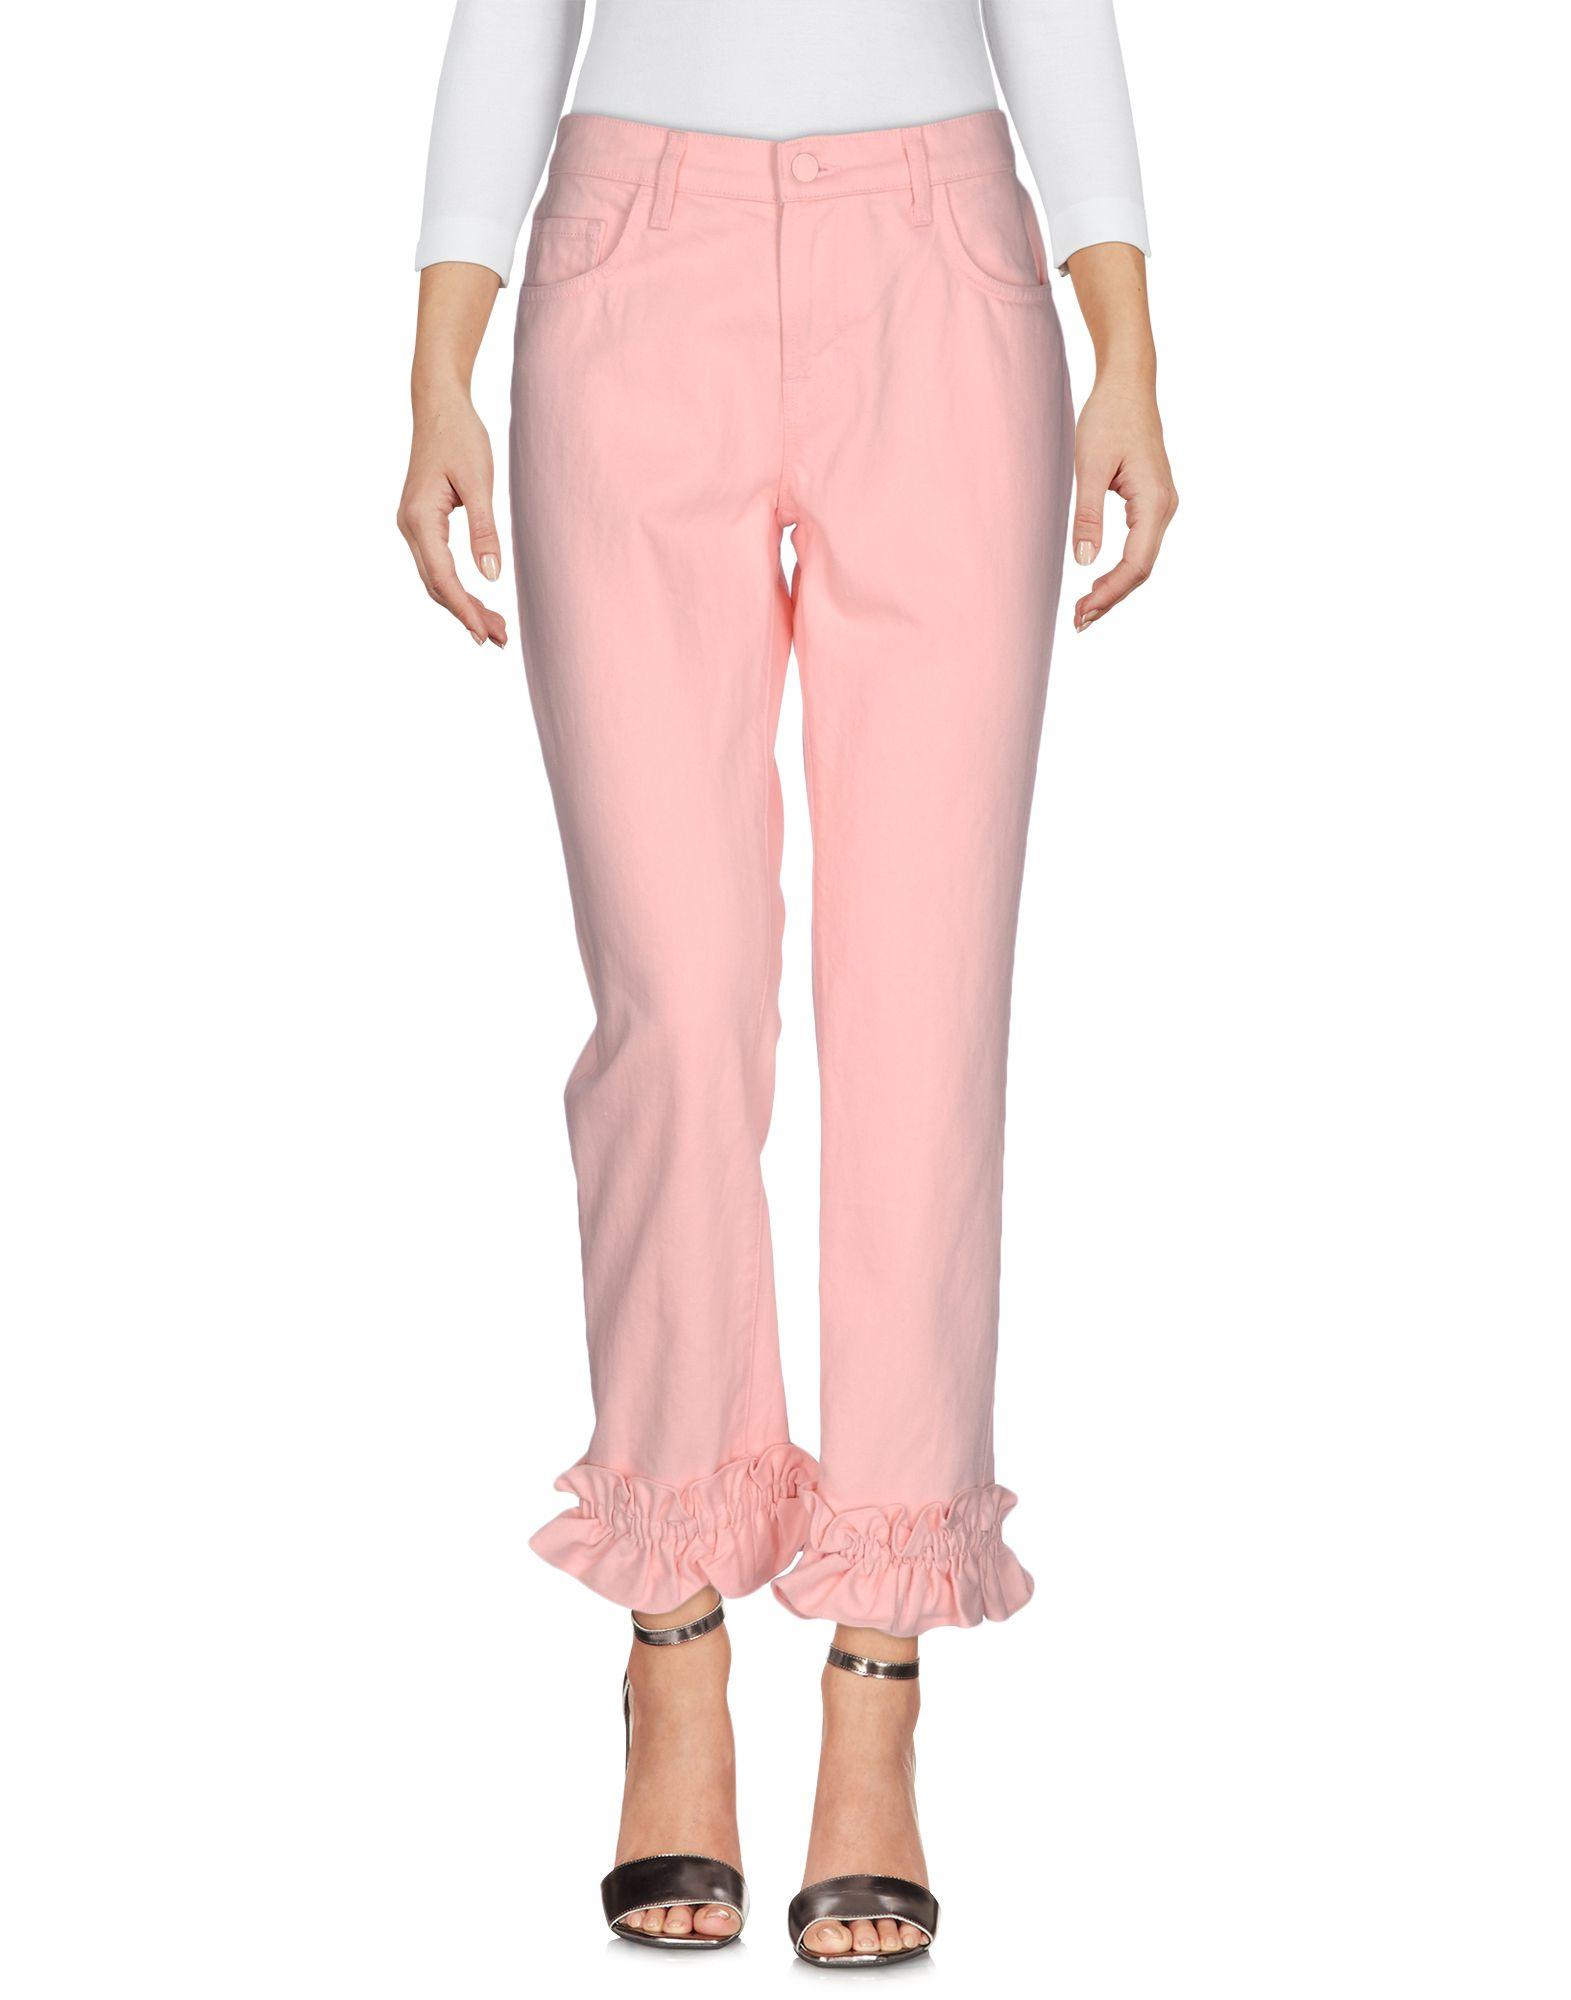 SIMONE ROCHA X J BRAND Denim Pants in Pink